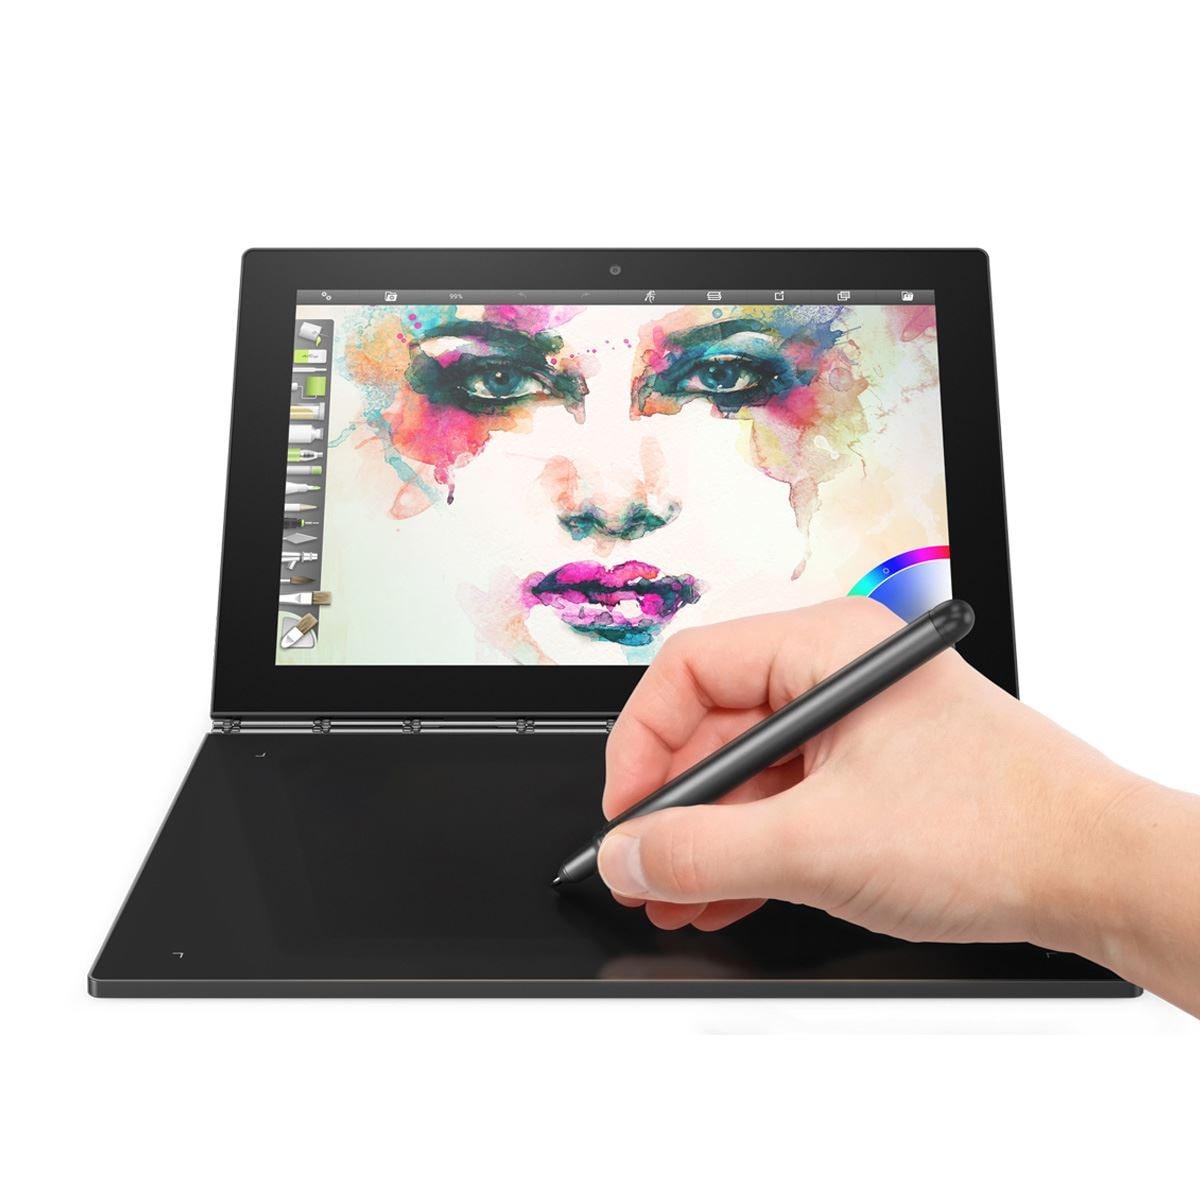 Tablet Yoga Book Lenovo 64GB